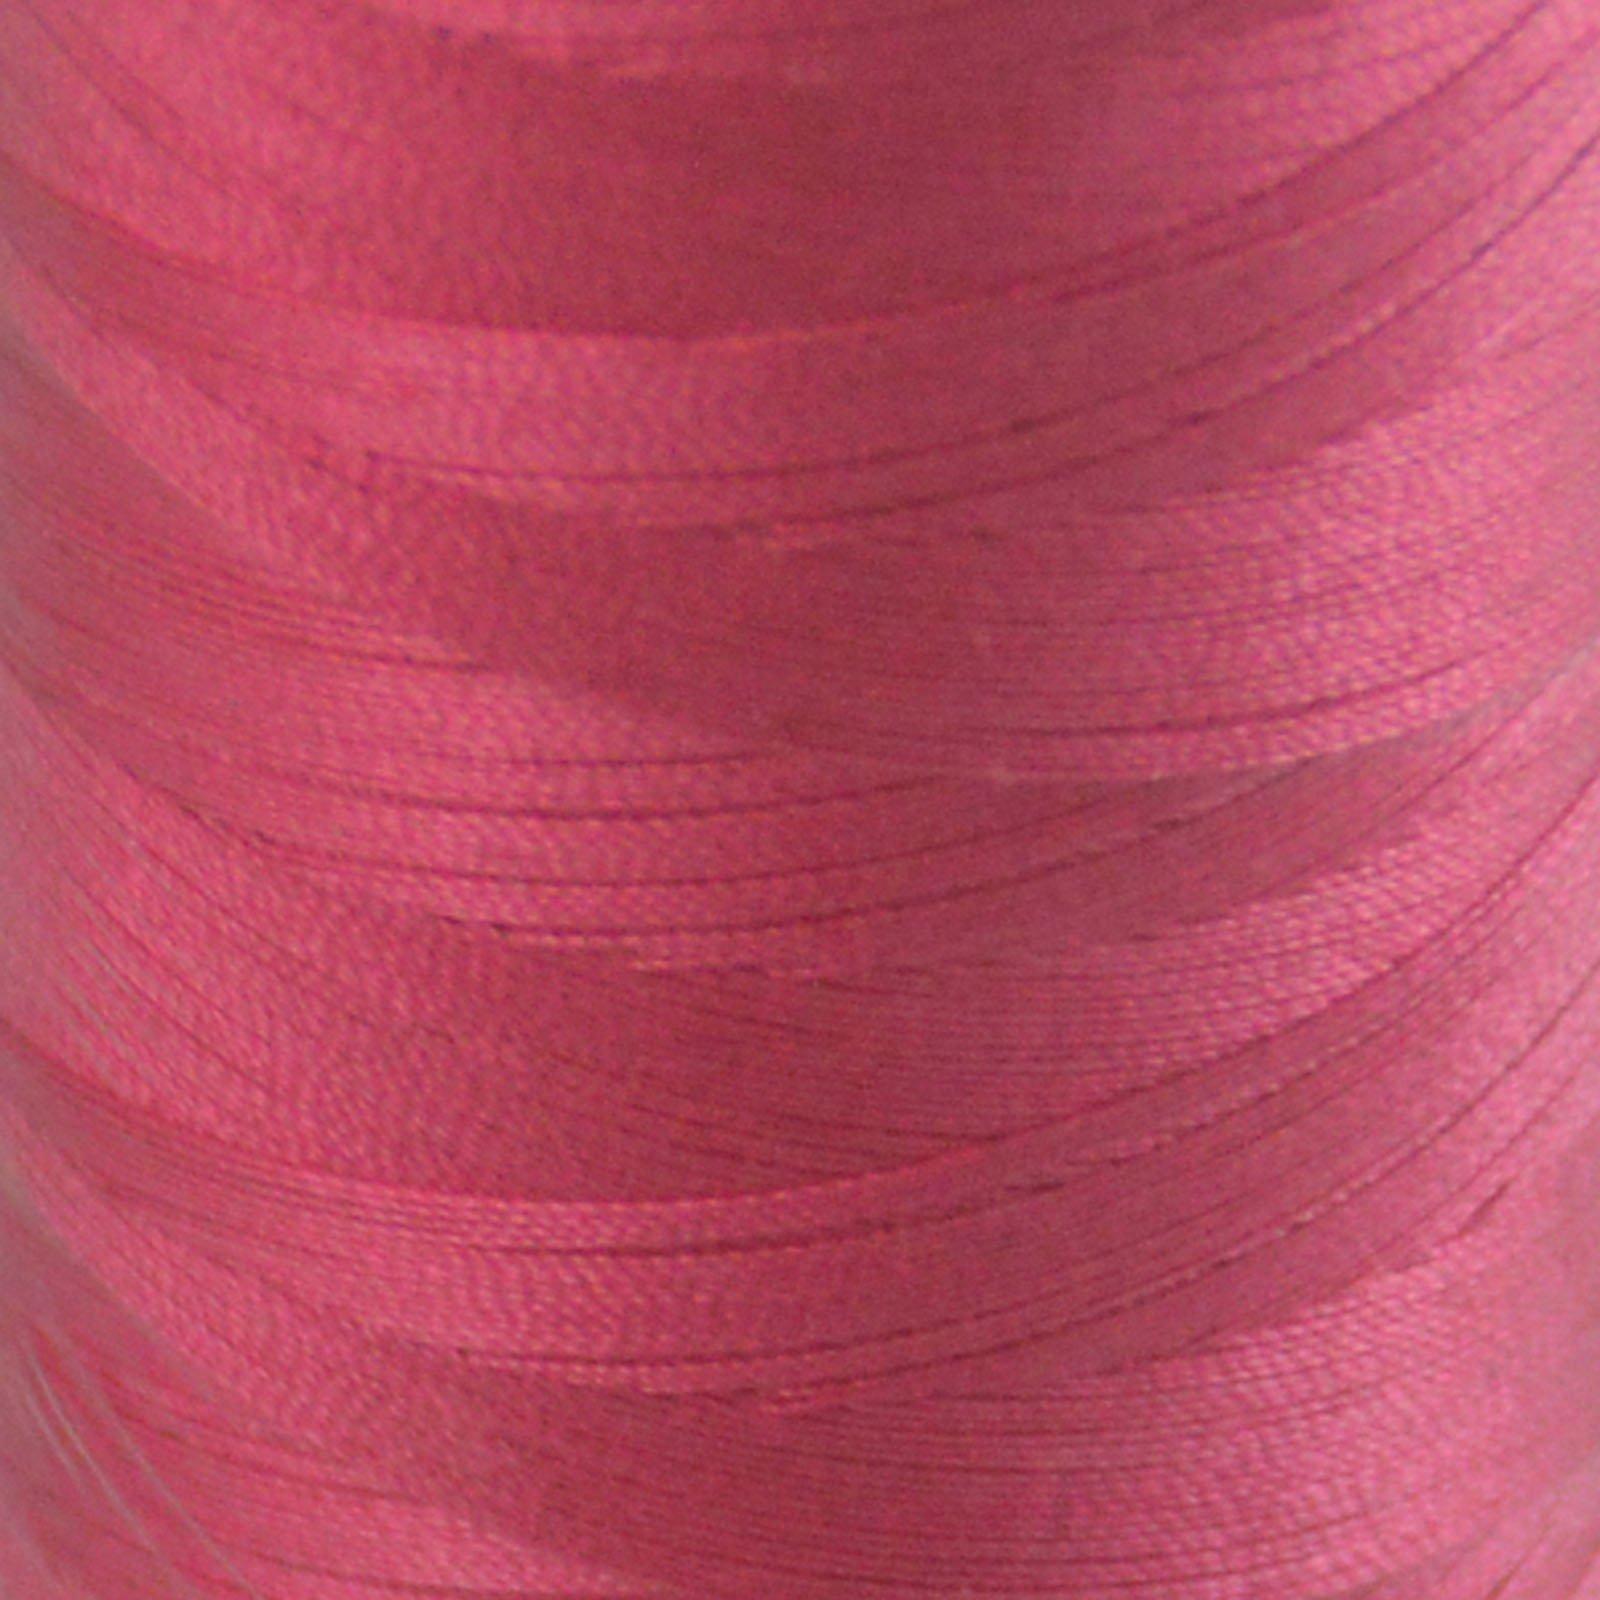 #2530 Blossom Pink